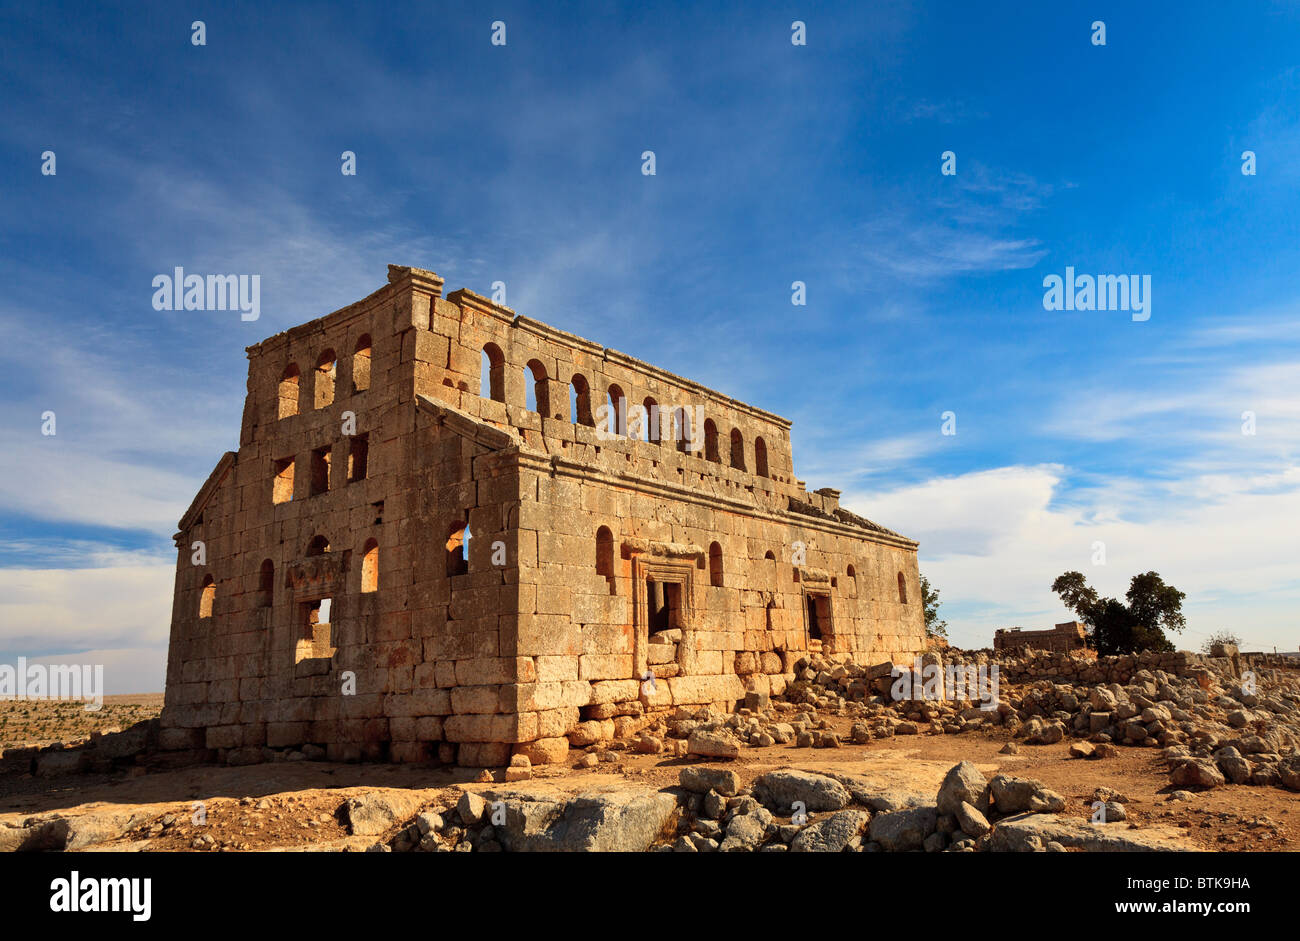 Byzantine Church in the forgotten deserted city of Mushabbaq near Aleppo, Syria - Stock Image